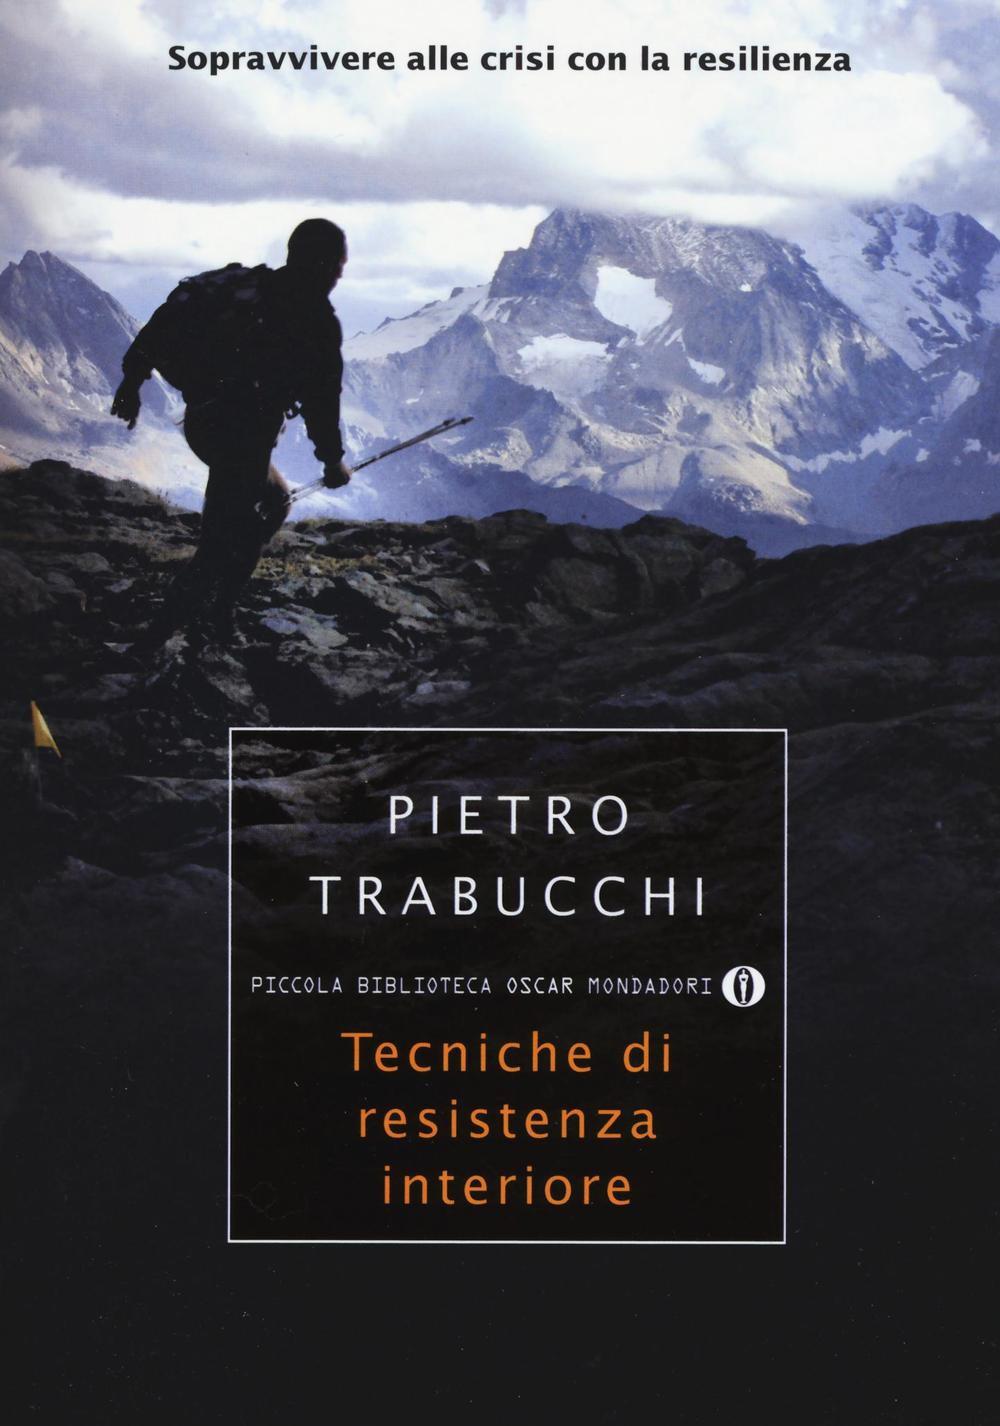 Pietro Trabucchi